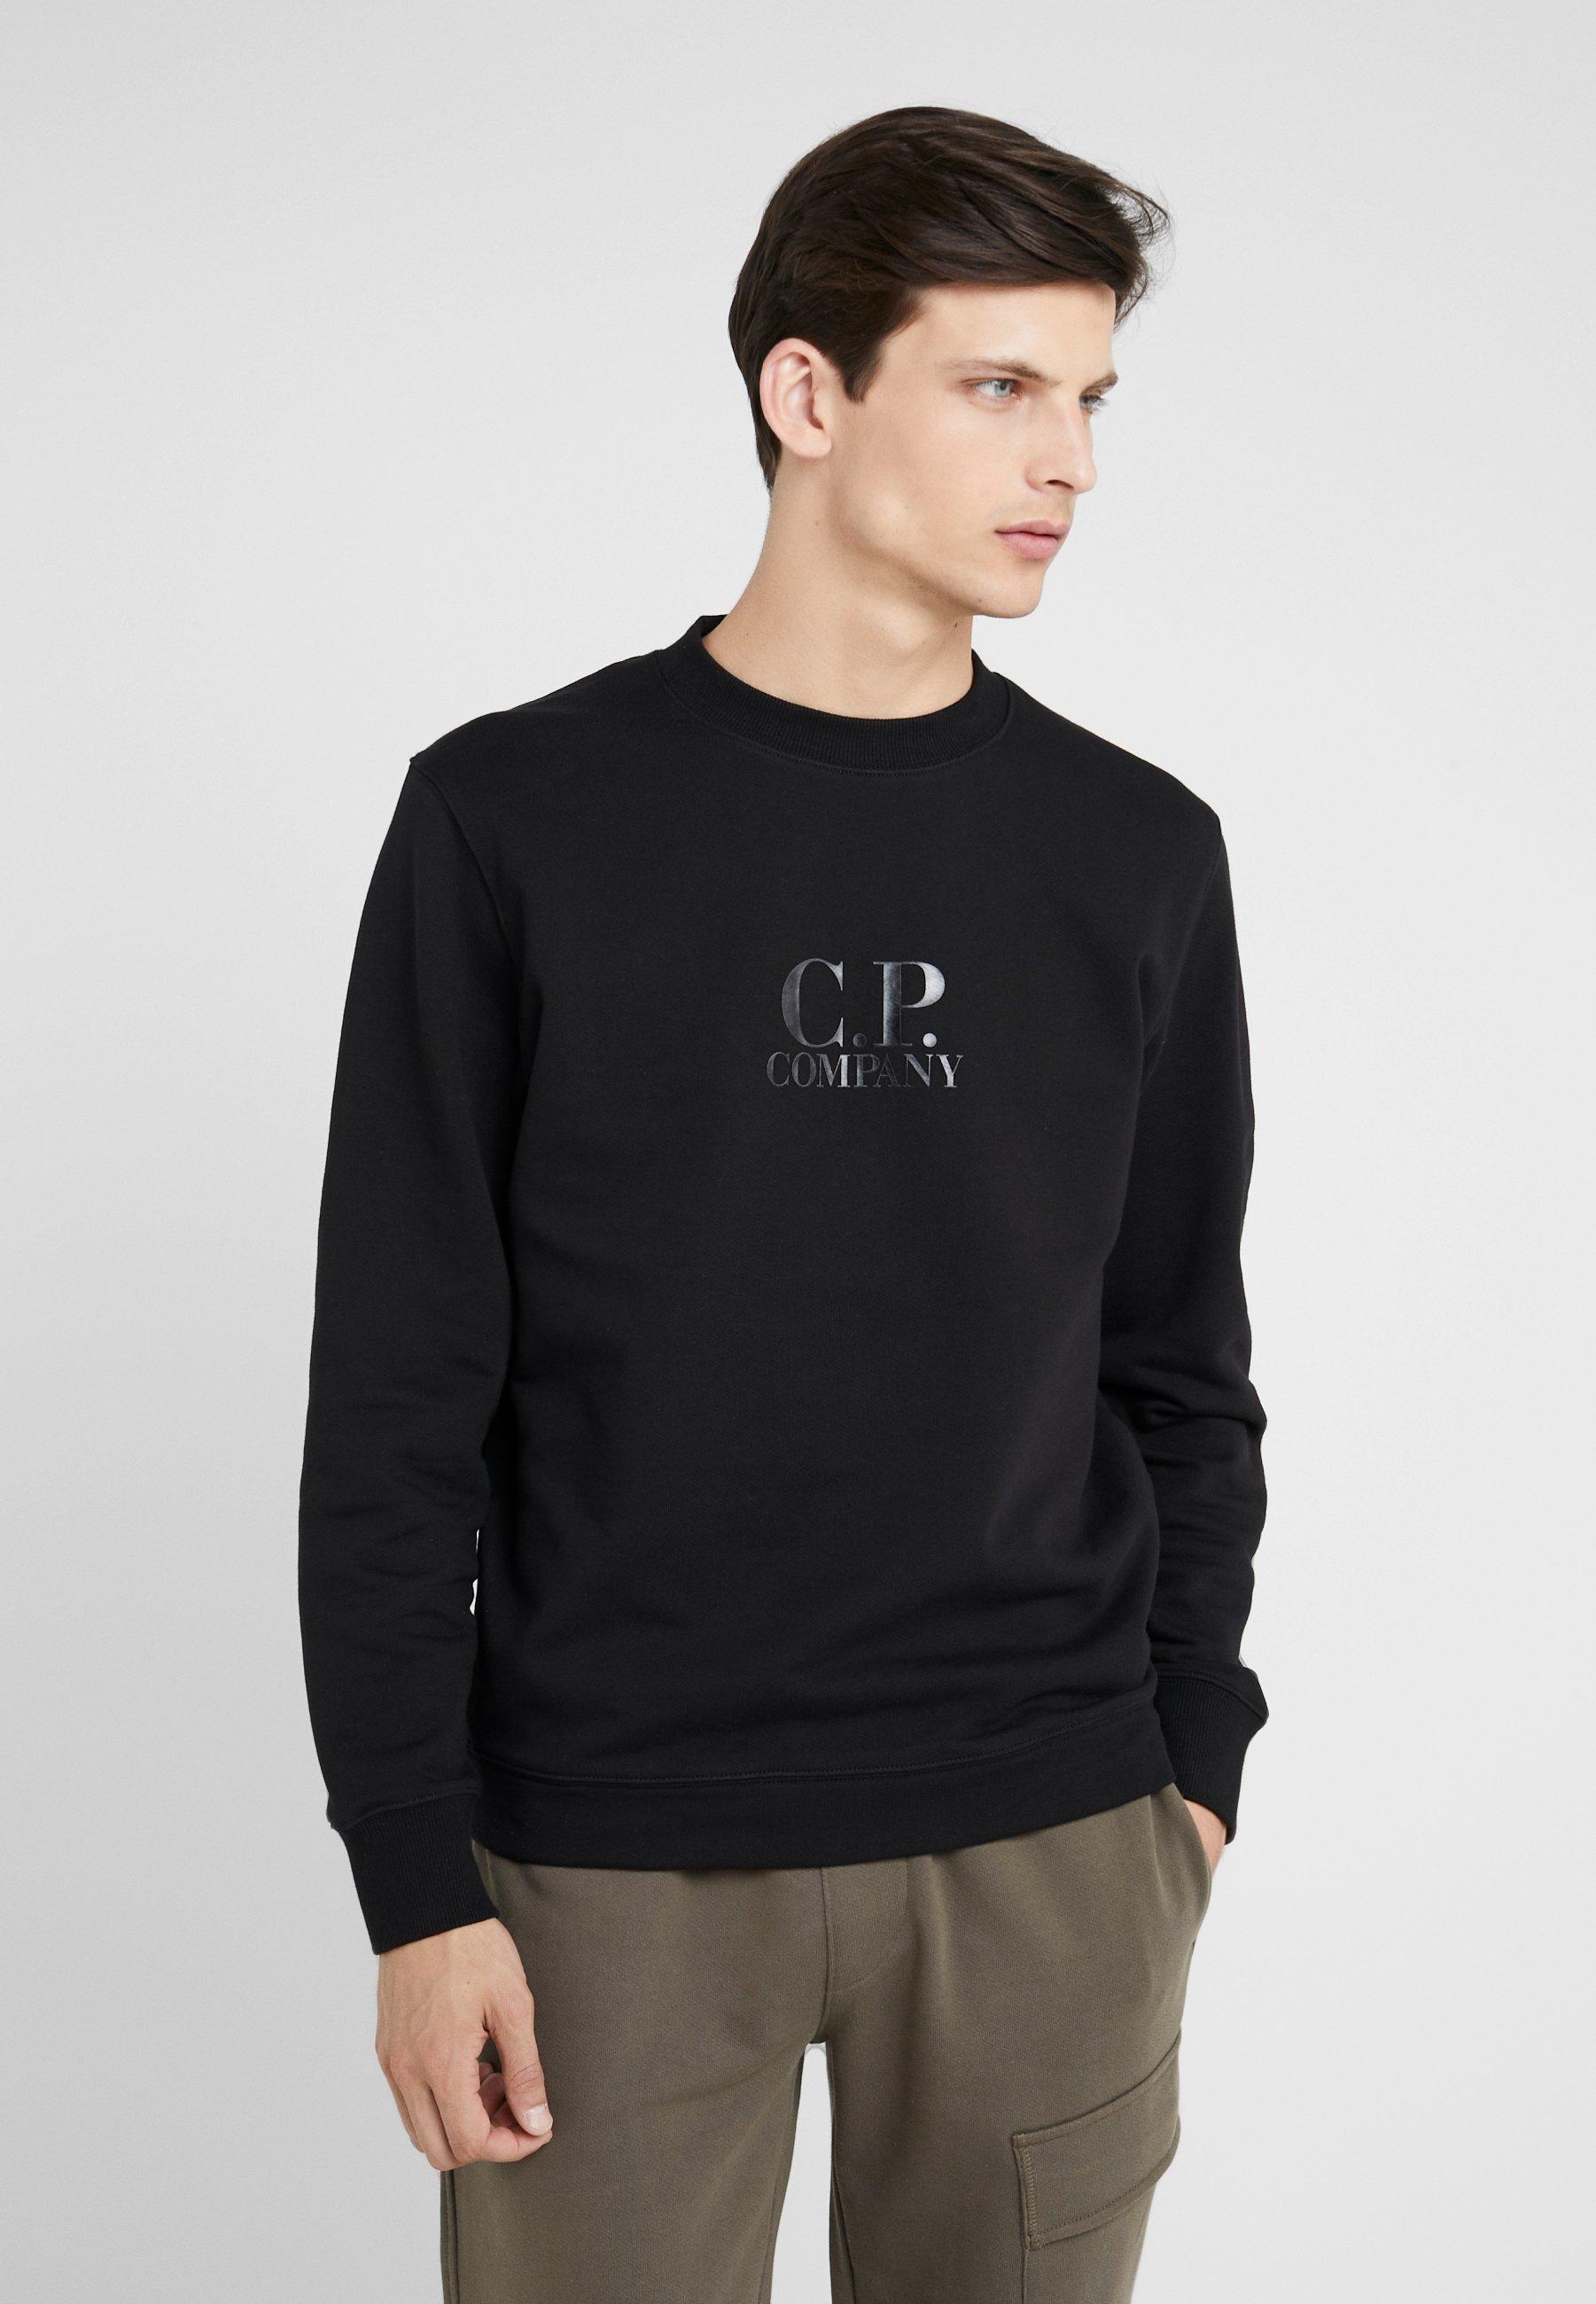 pCompany Crew RaisedSweatshirt C Neck Logo Diagonal Black wmNnv80O